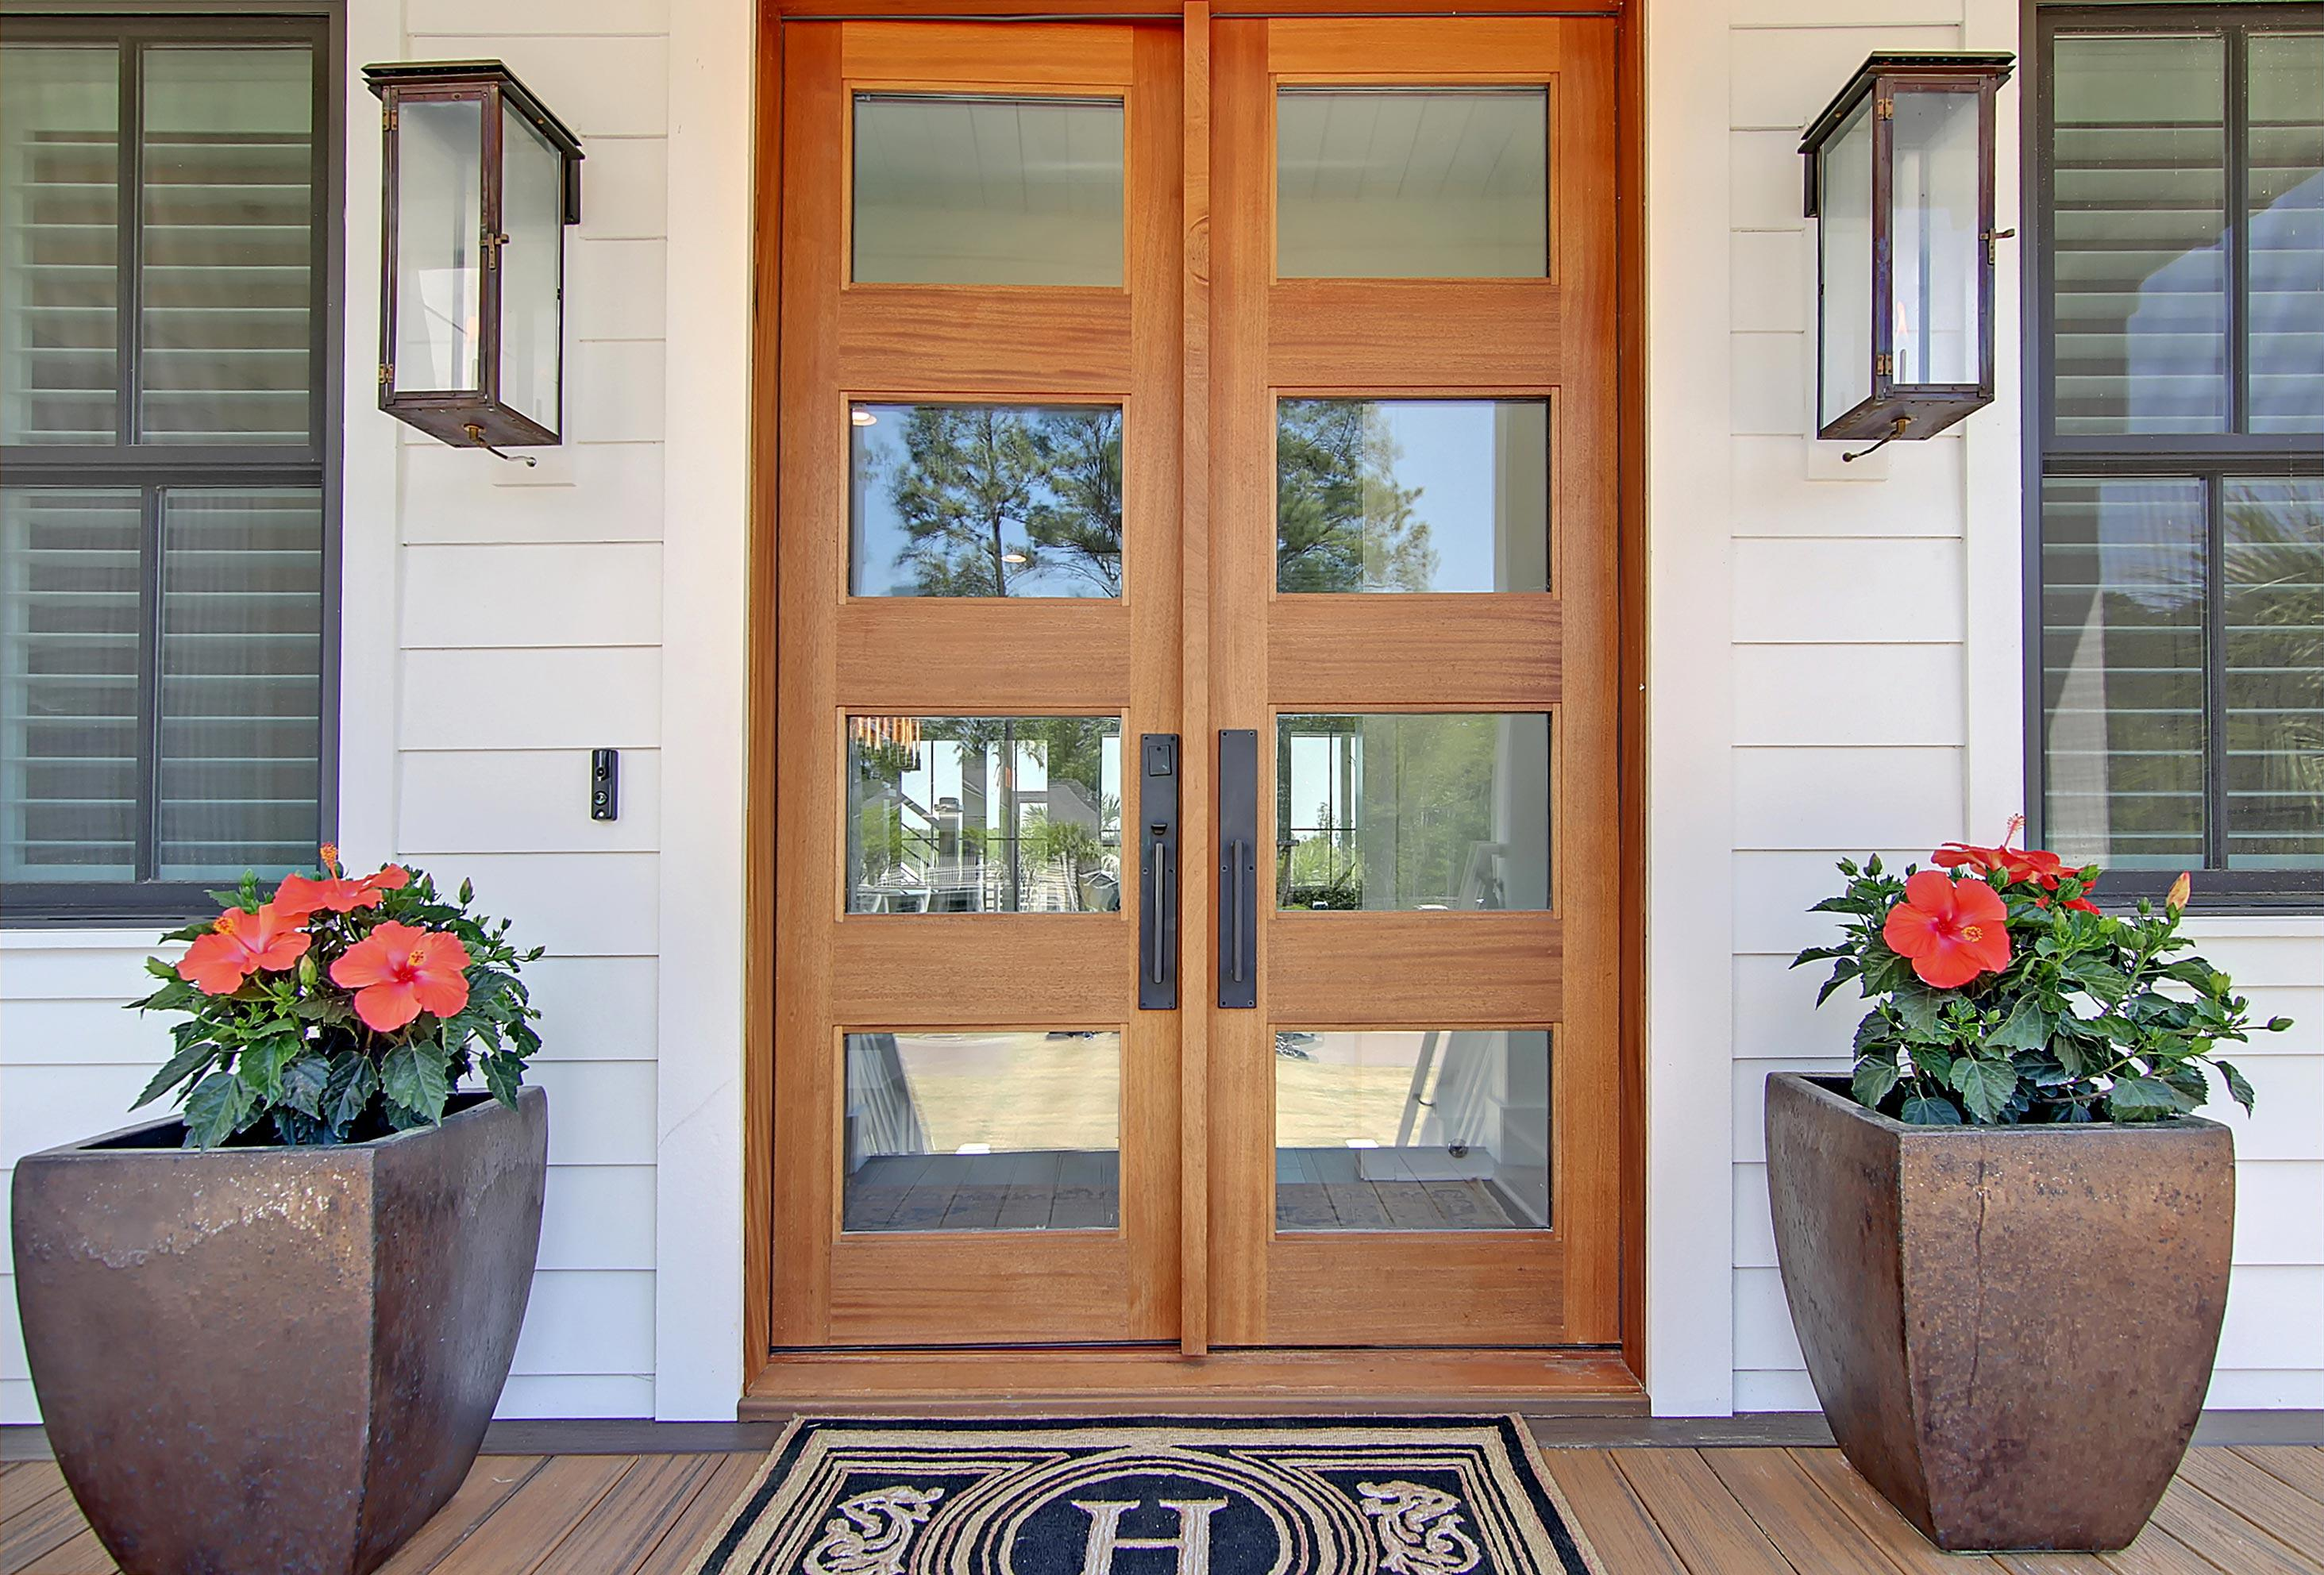 Dunes West Homes For Sale - 2456 Darts Cove, Mount Pleasant, SC - 40